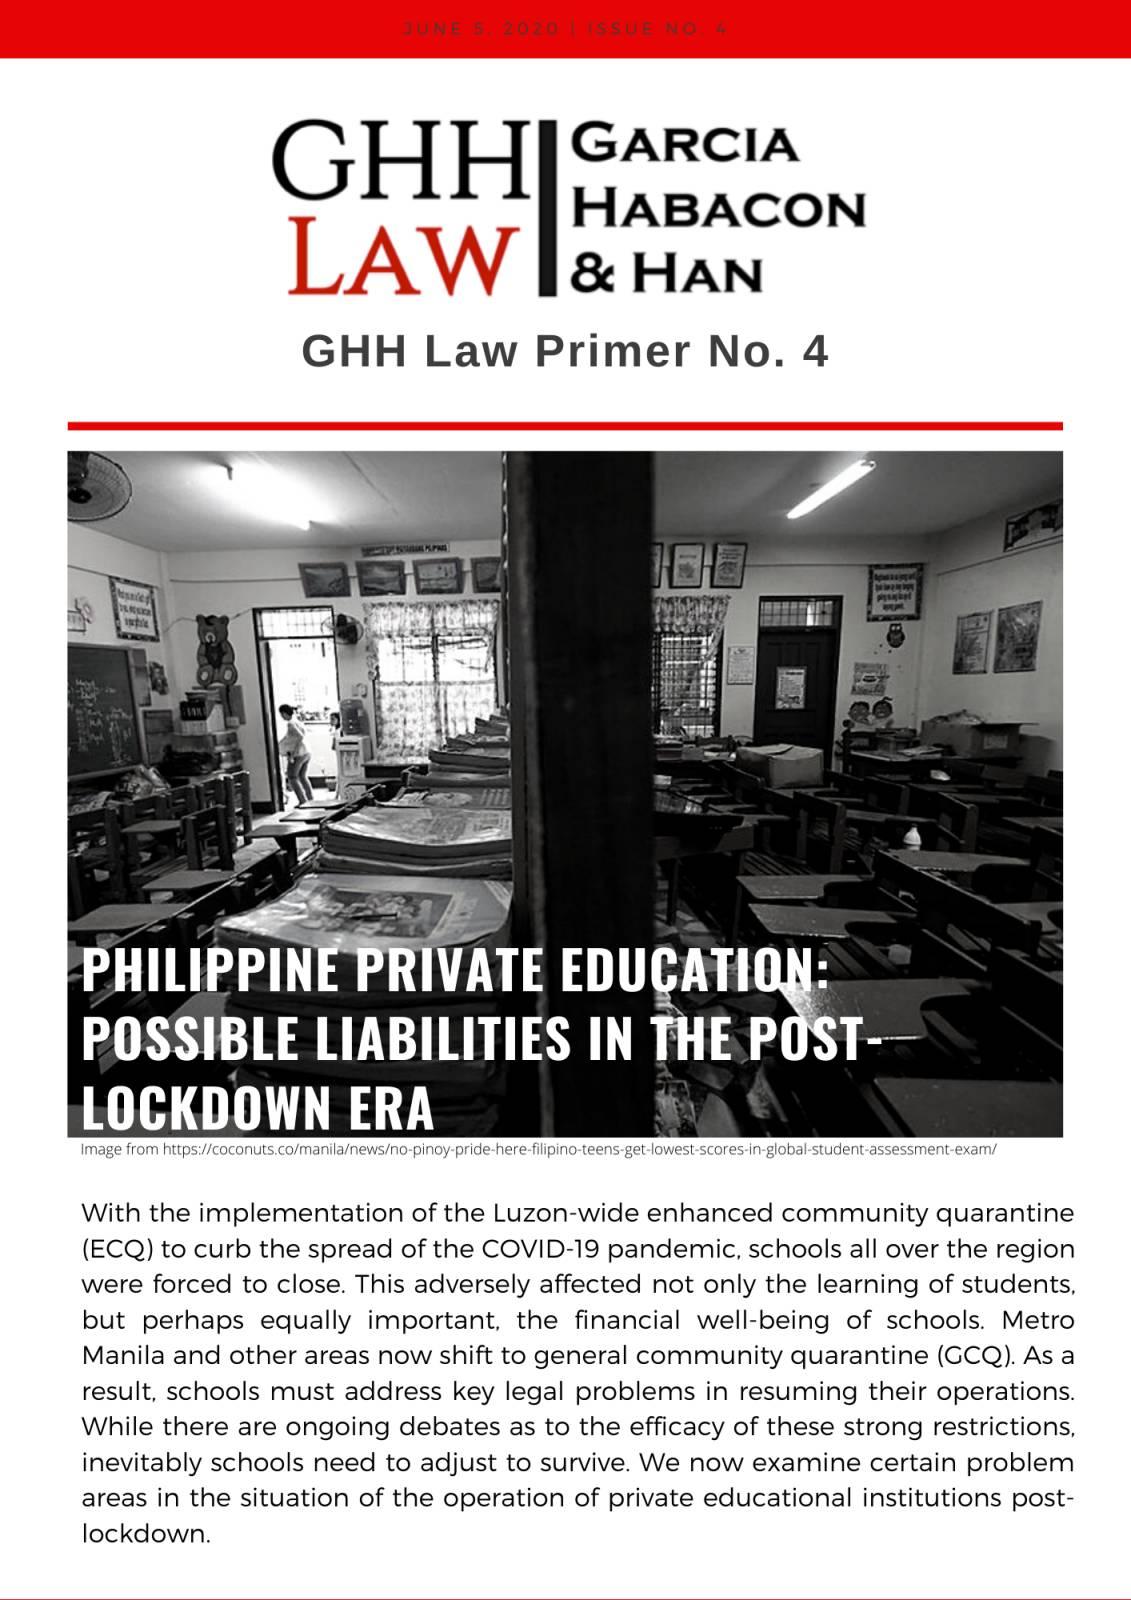 GHH Law Primer No. 4